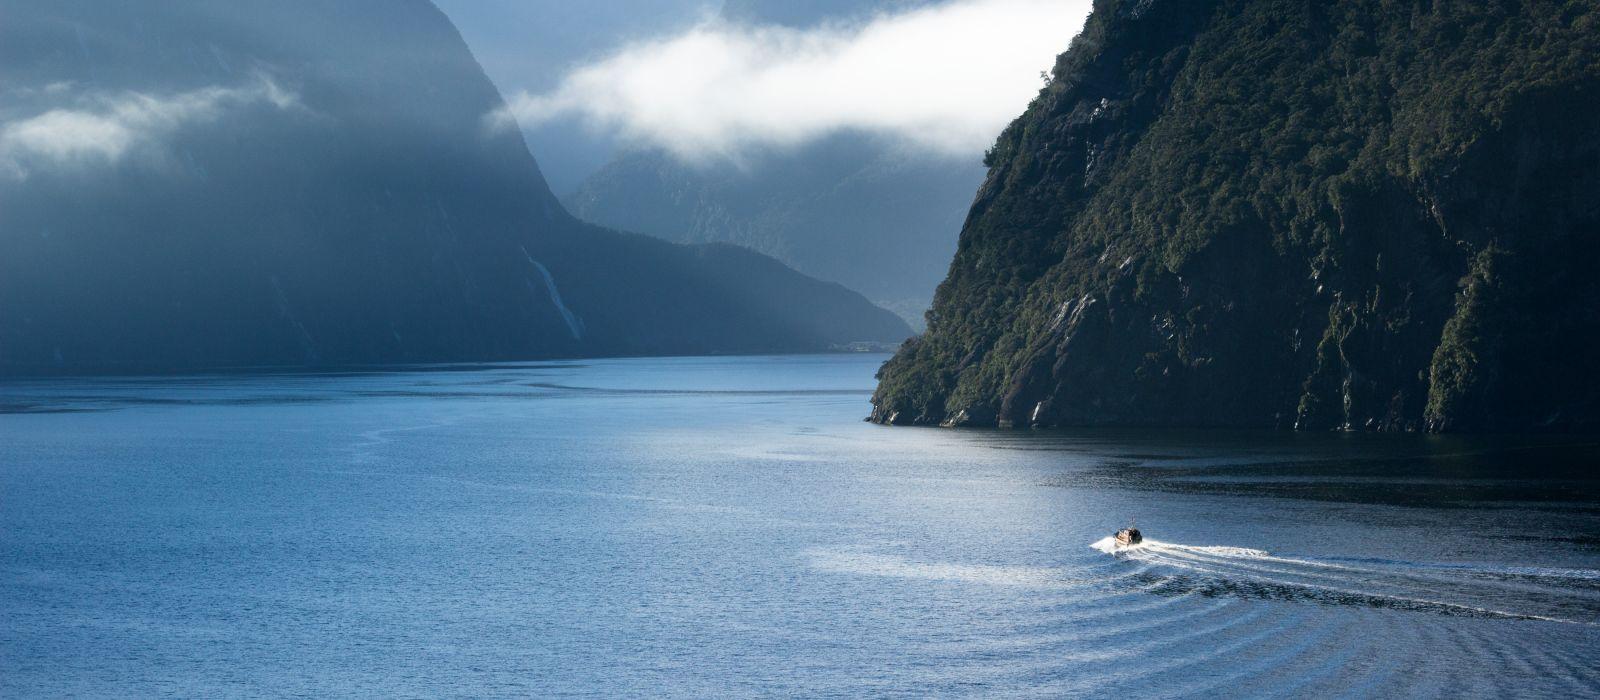 Milford Sound Fjordland, New Zealand, South Island, New Zealand